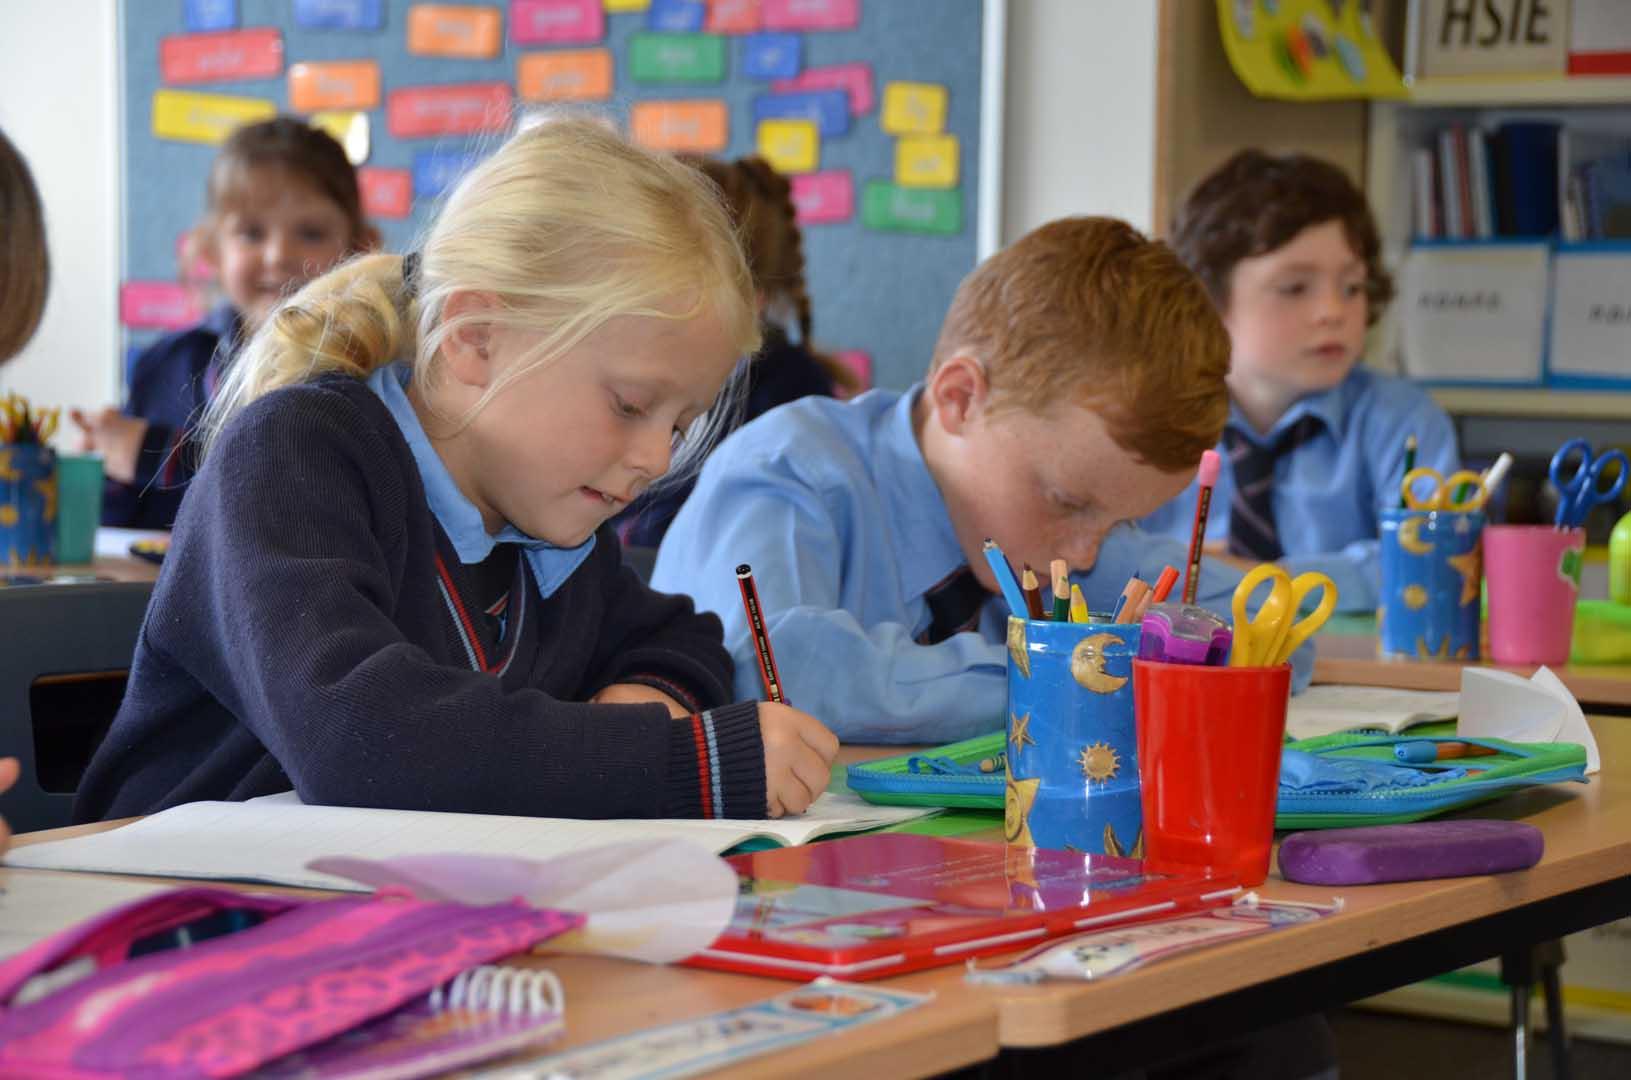 St-Patricks-walcha-classroom76